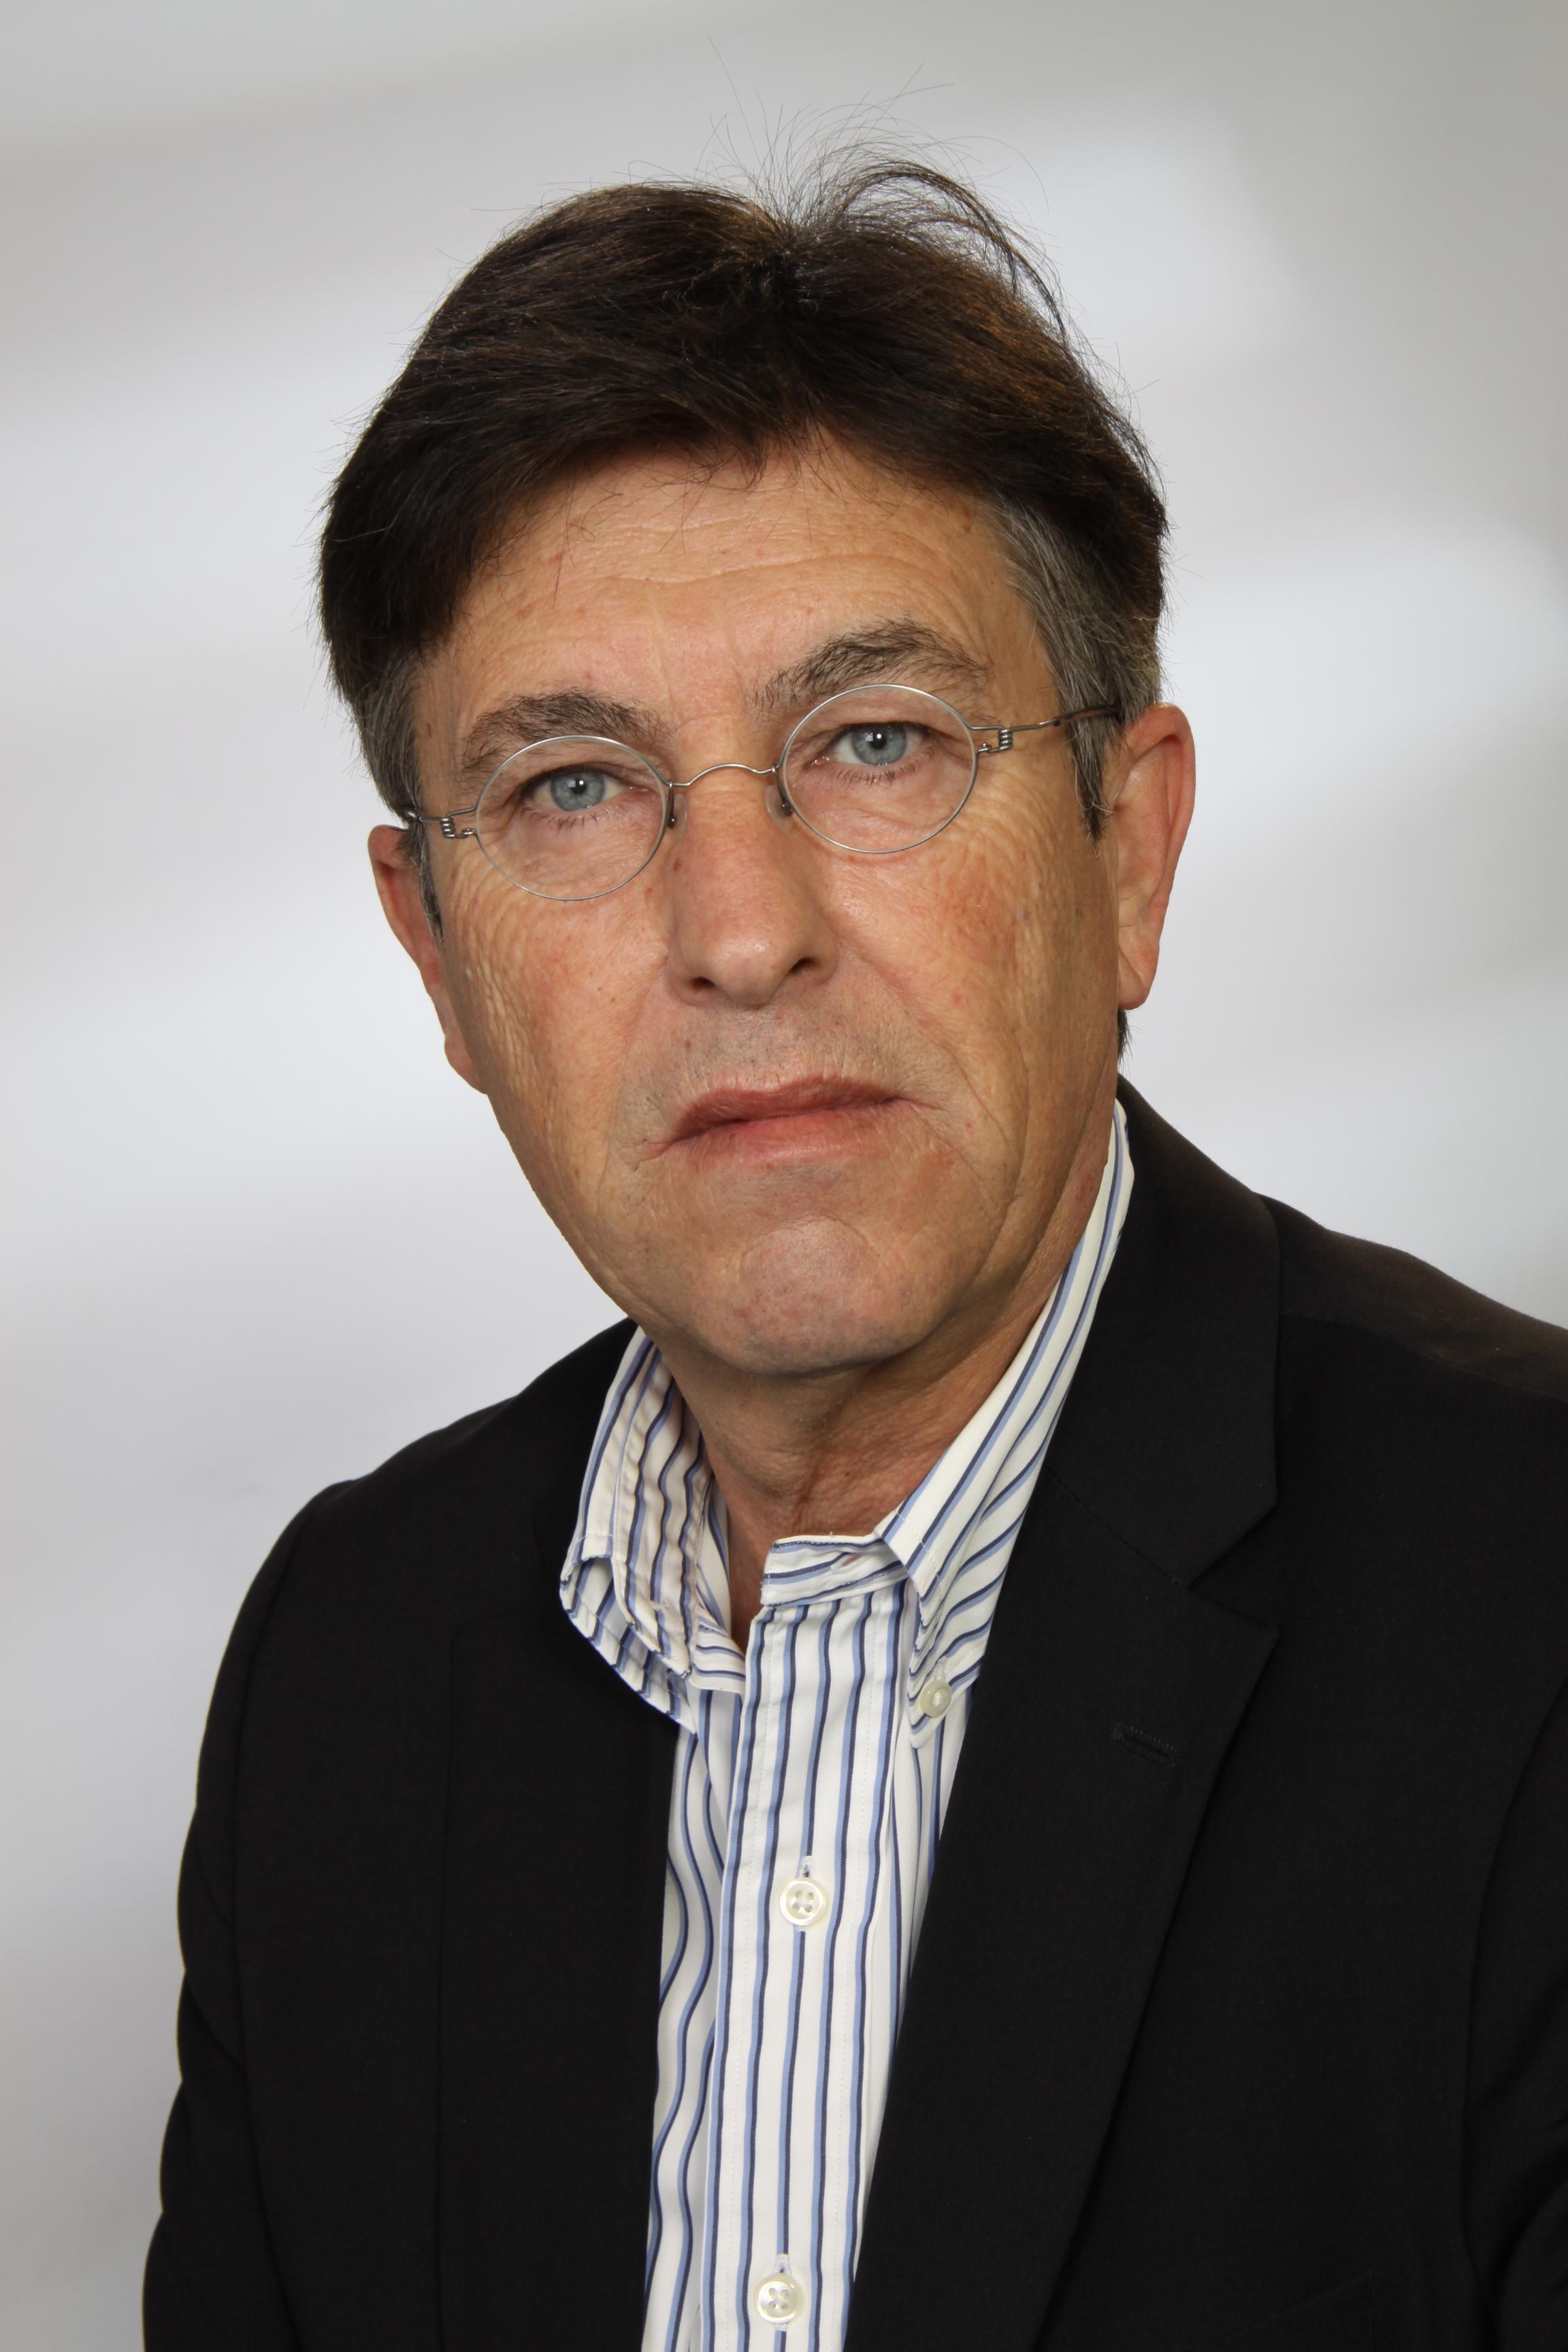 Günter Mauß, Executive Vice President, Hexagon PPM